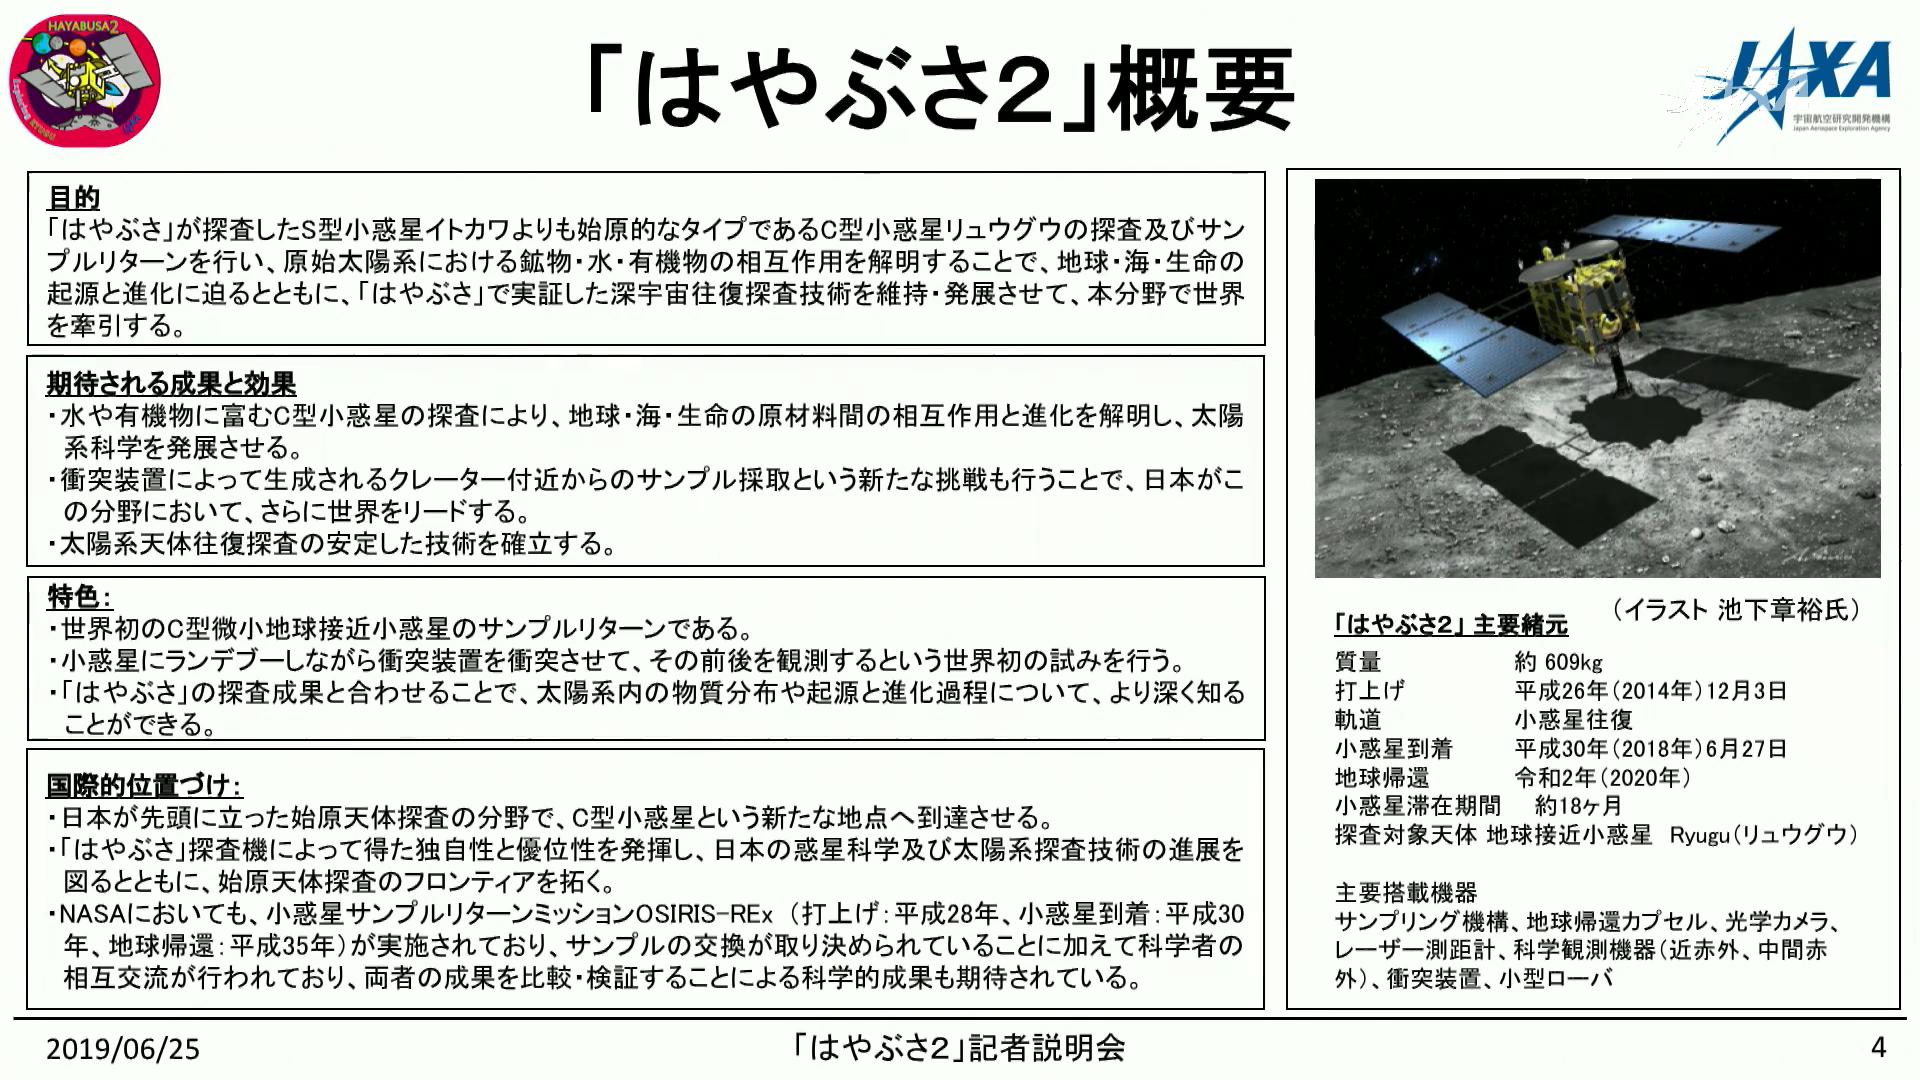 f:id:Imamura:20190625234642p:plain